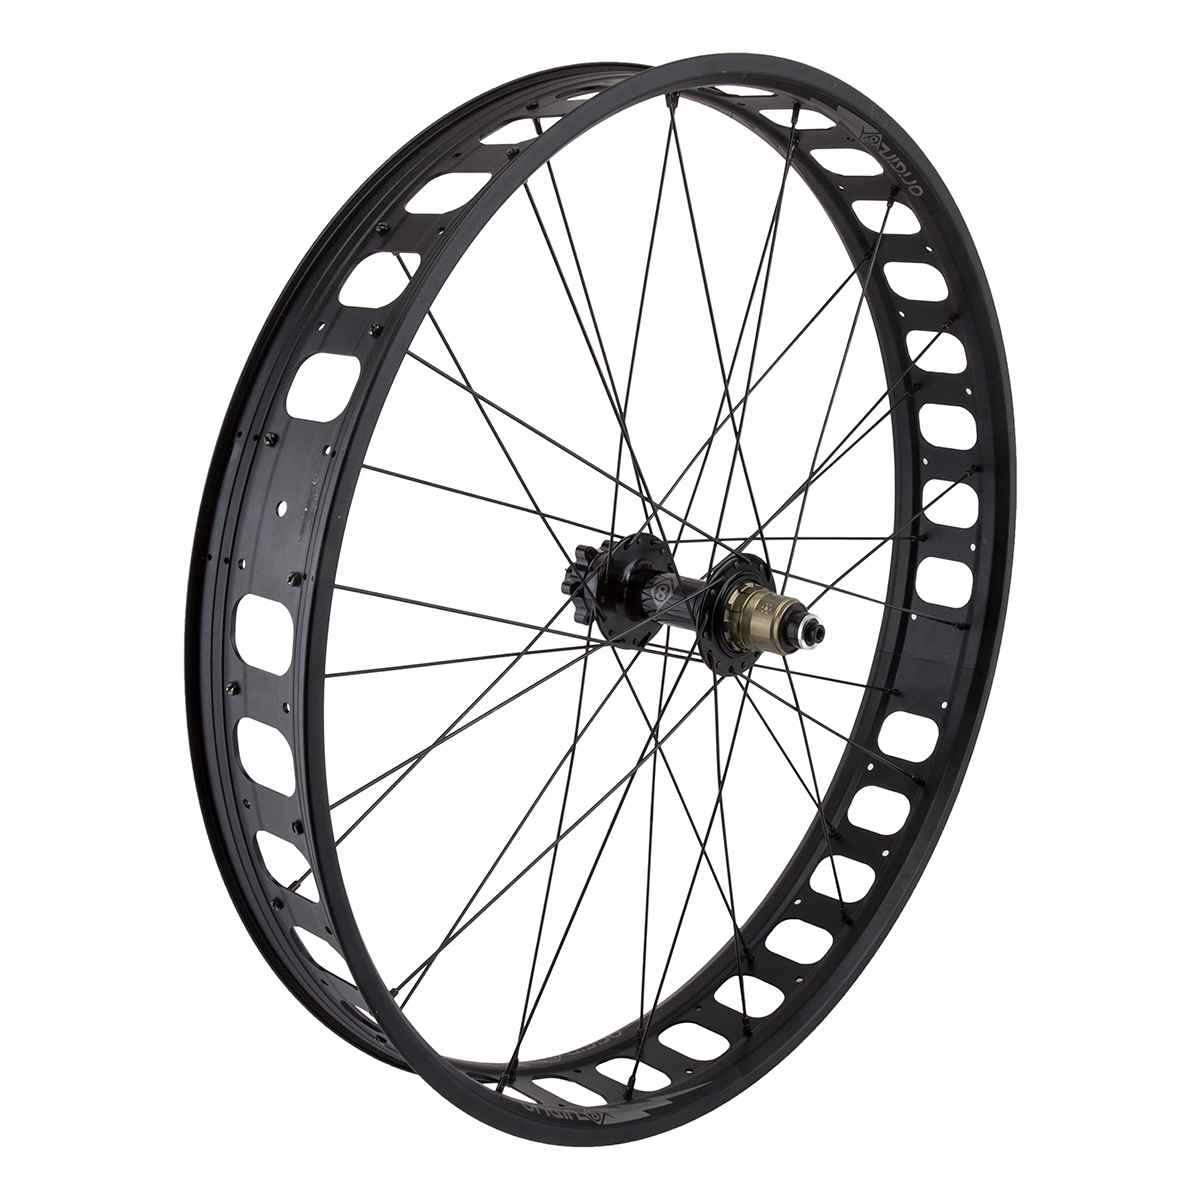 Wheel Masters Whl Rr 26x4 0 559x84 Bolt Aly Fat 14mm Tbls Disc Bk 32